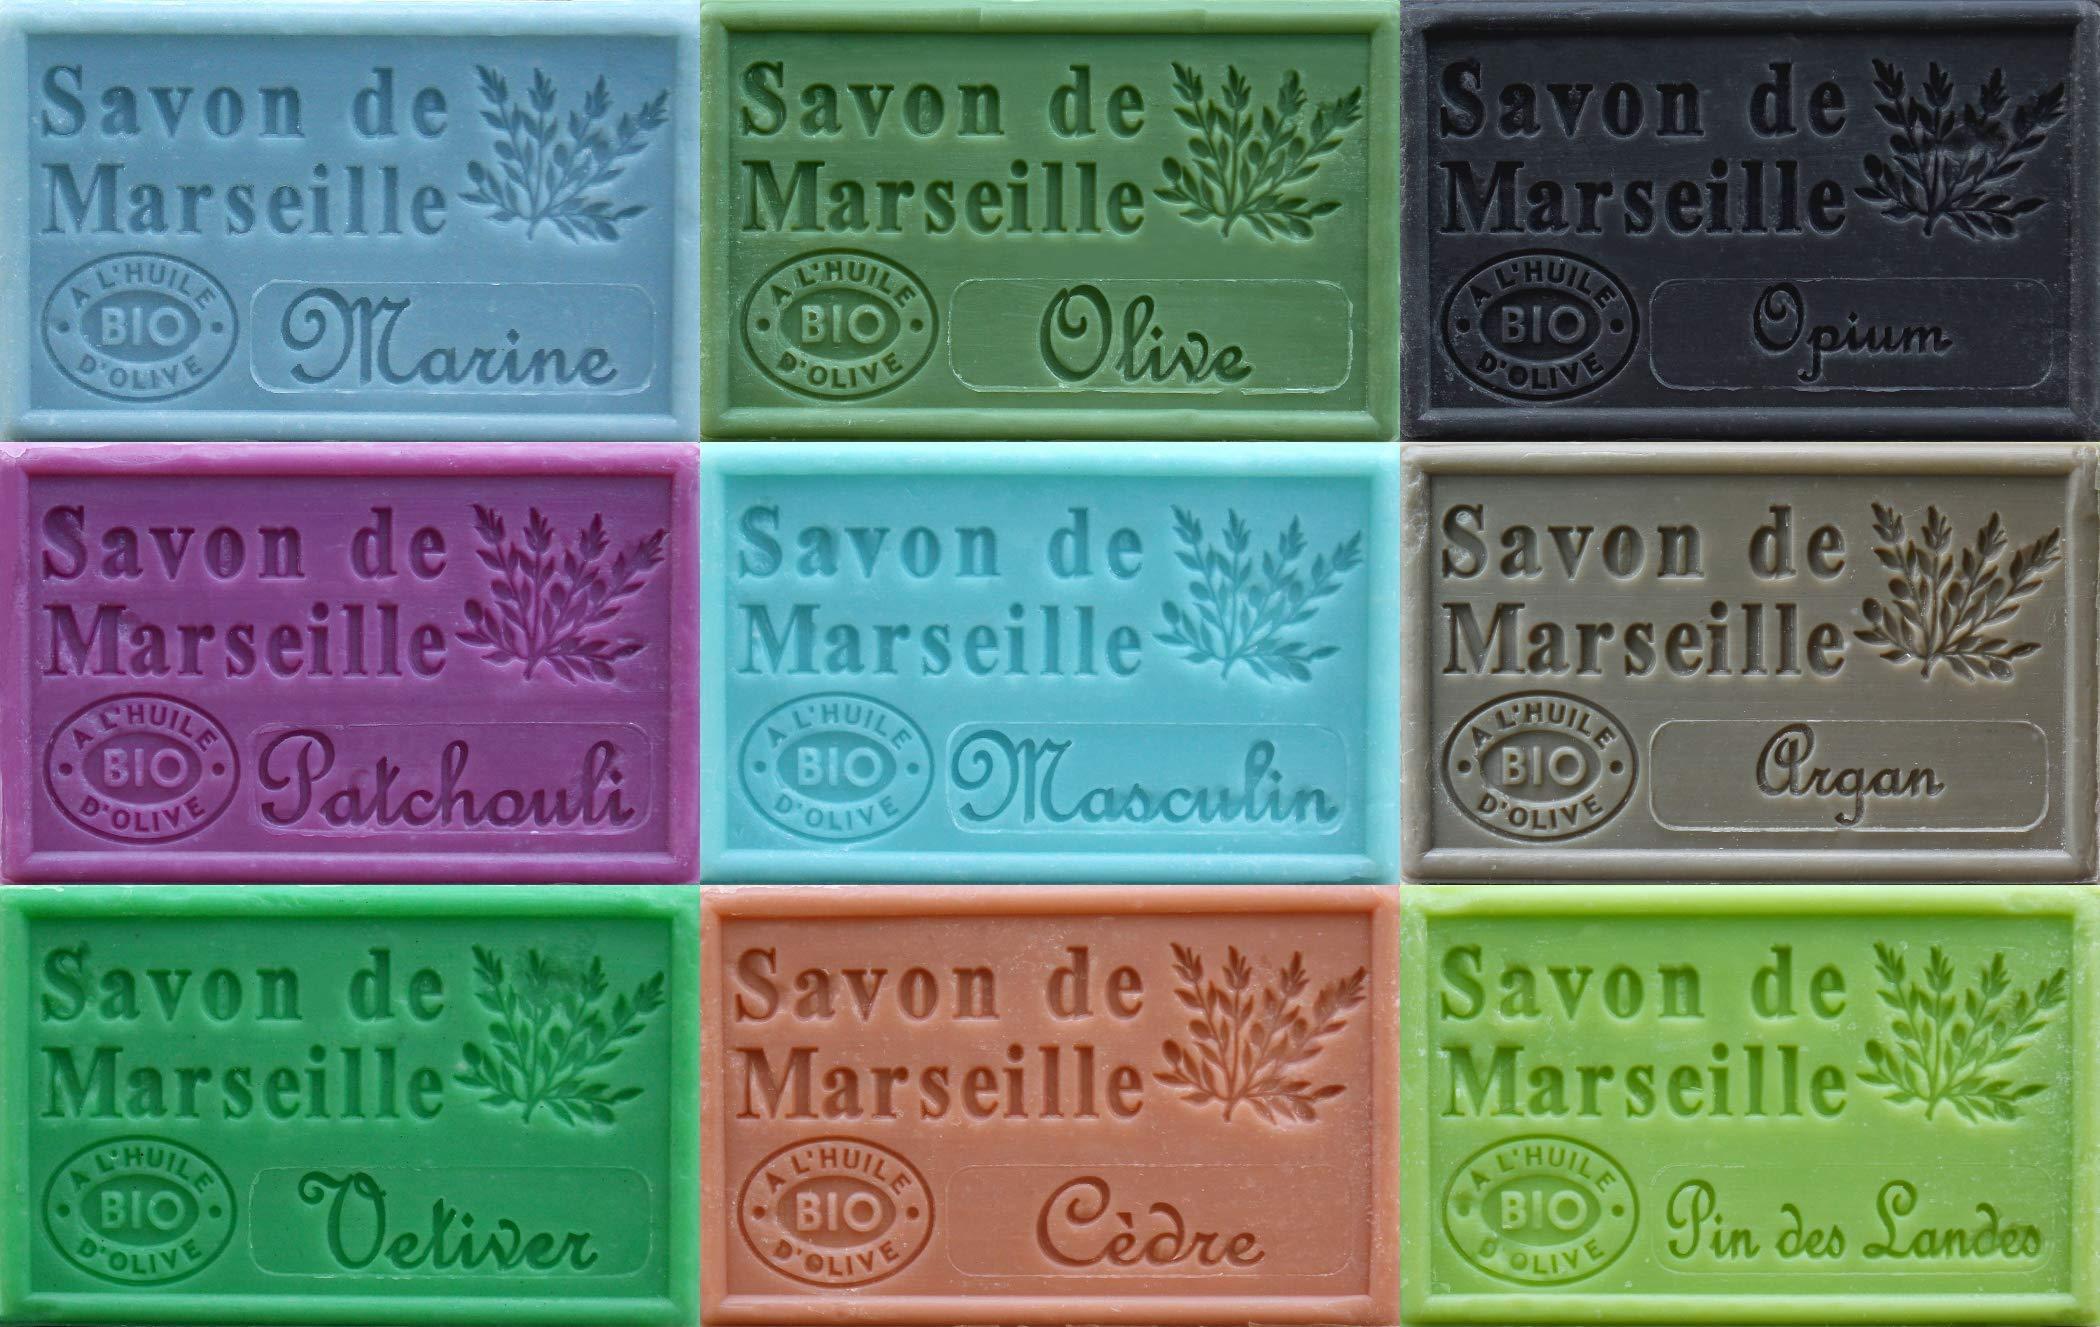 Savon de Marseille French Soaps, Boxed Set of 9 x 125g Soap Bars (Masculine Fragrances), Vegetable Soap